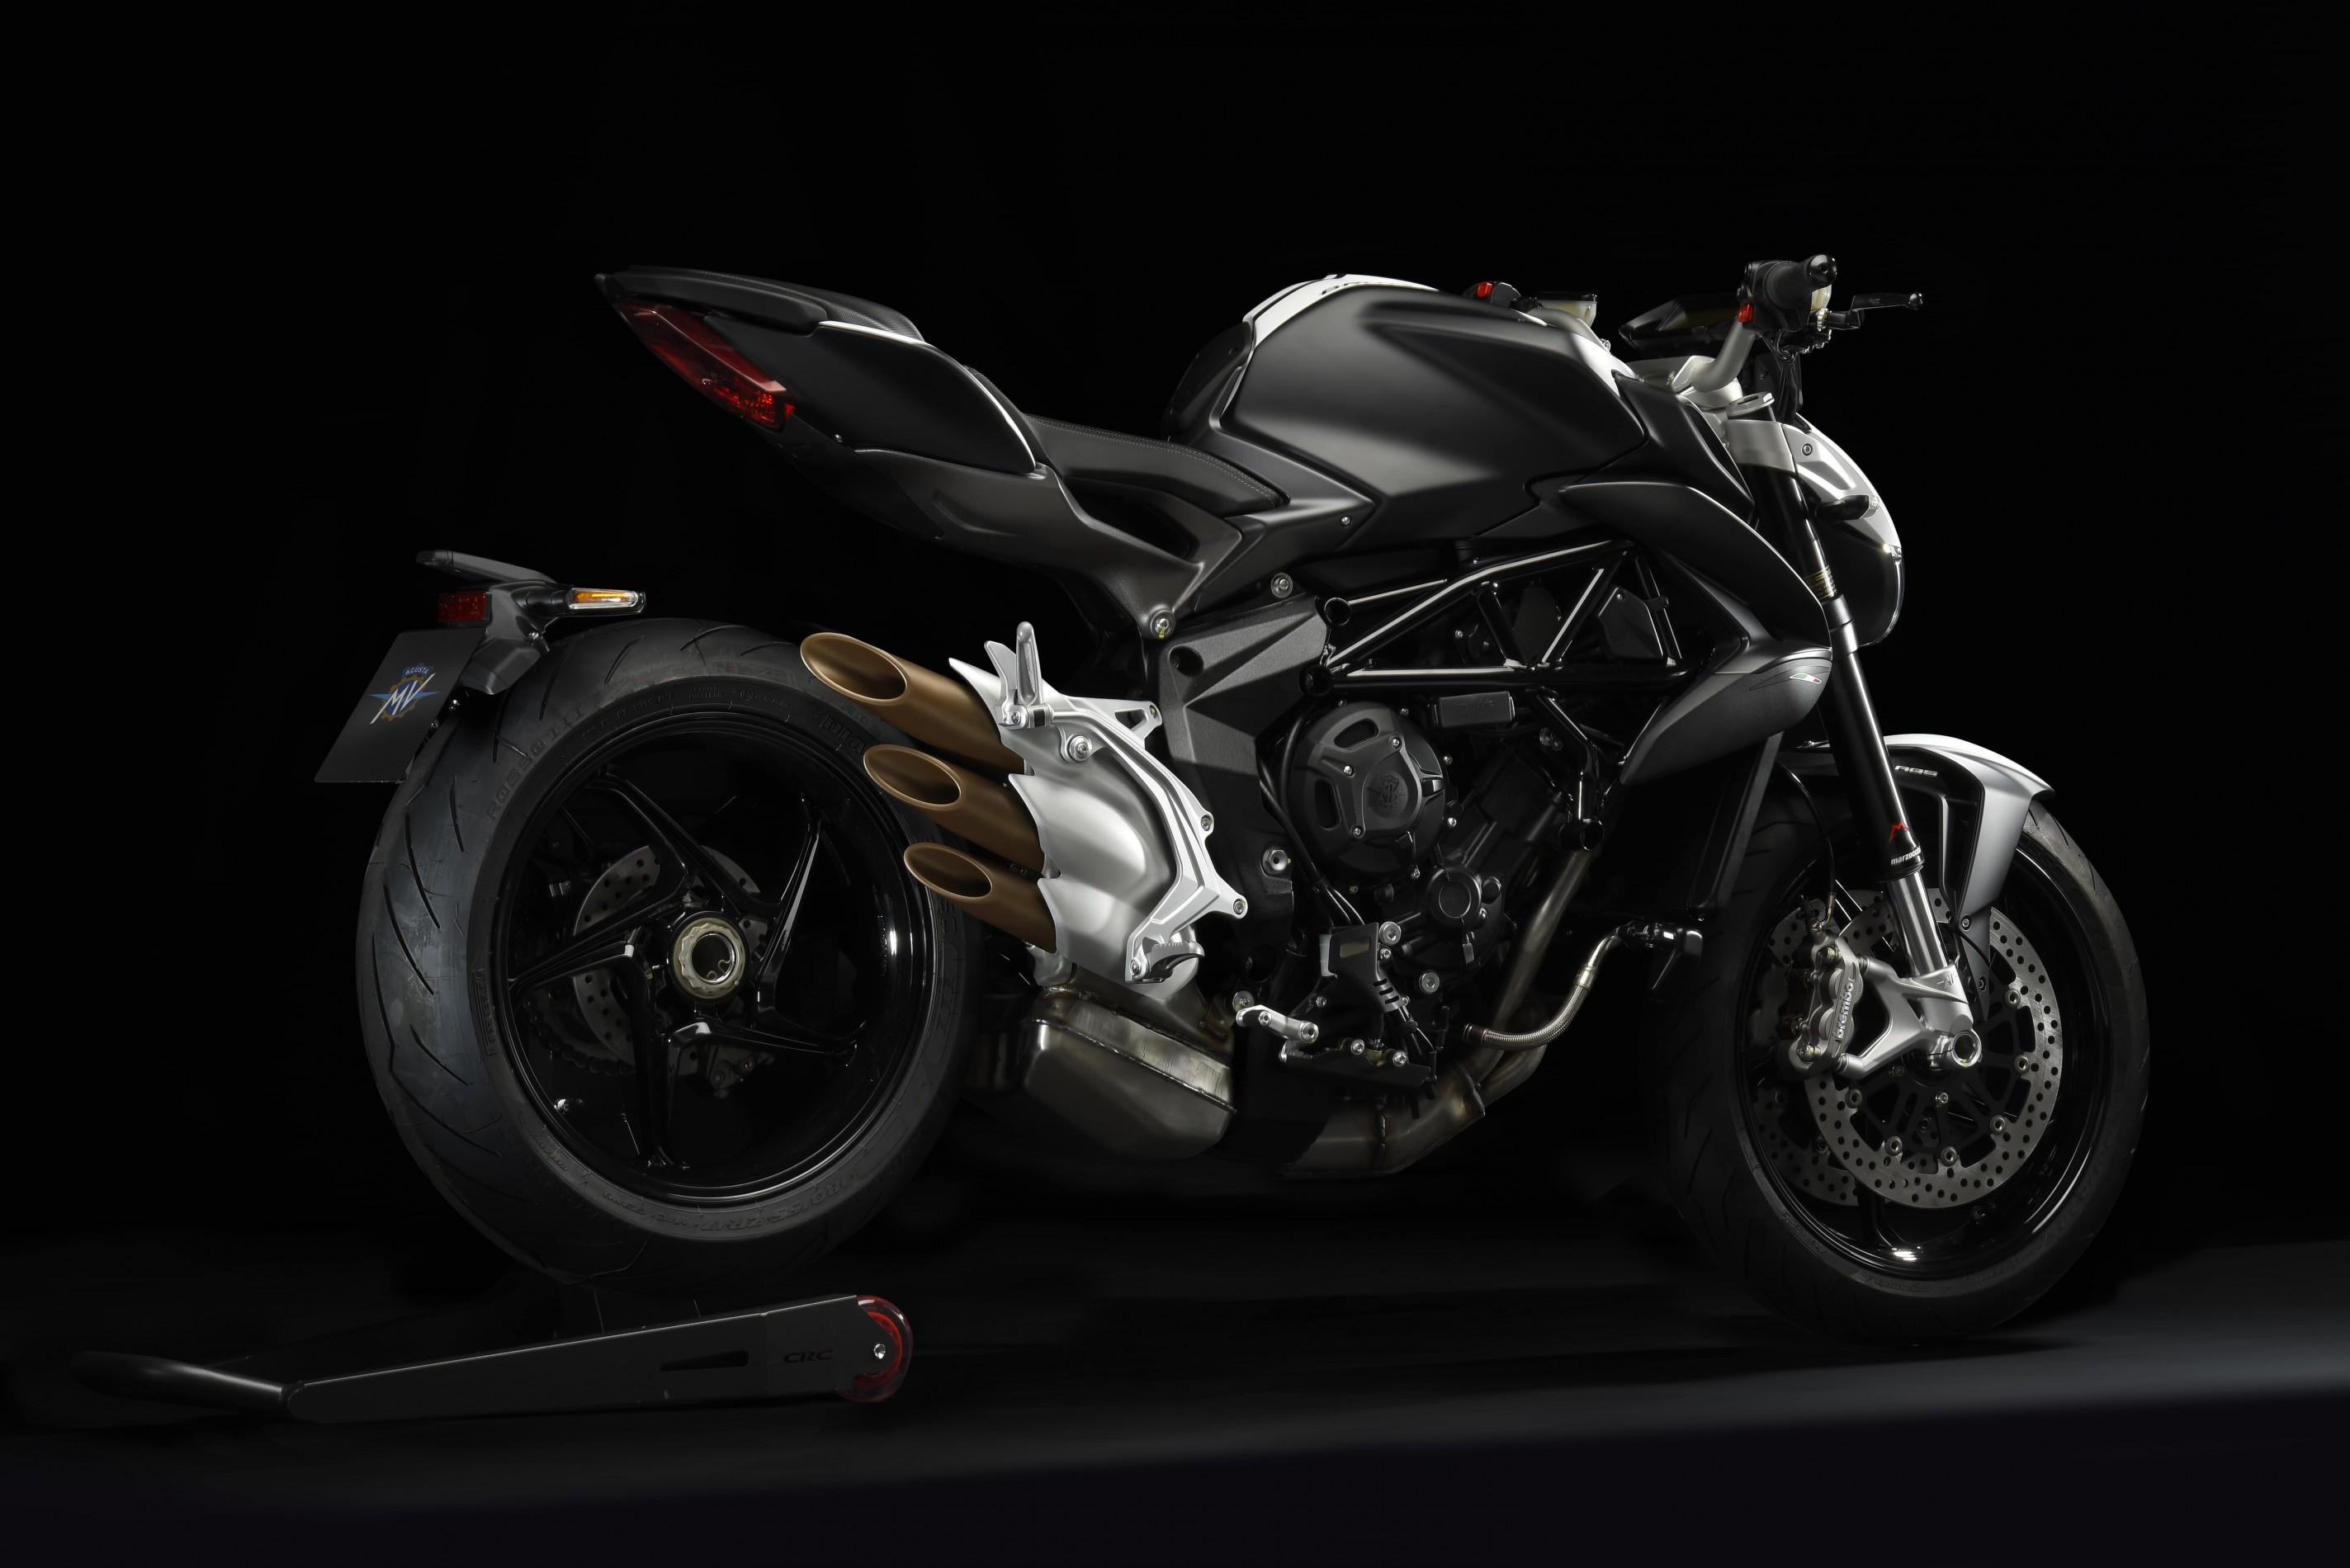 MV AGUSTA BRUTALE800 2019 黑色 - 「Webike摩托車市」